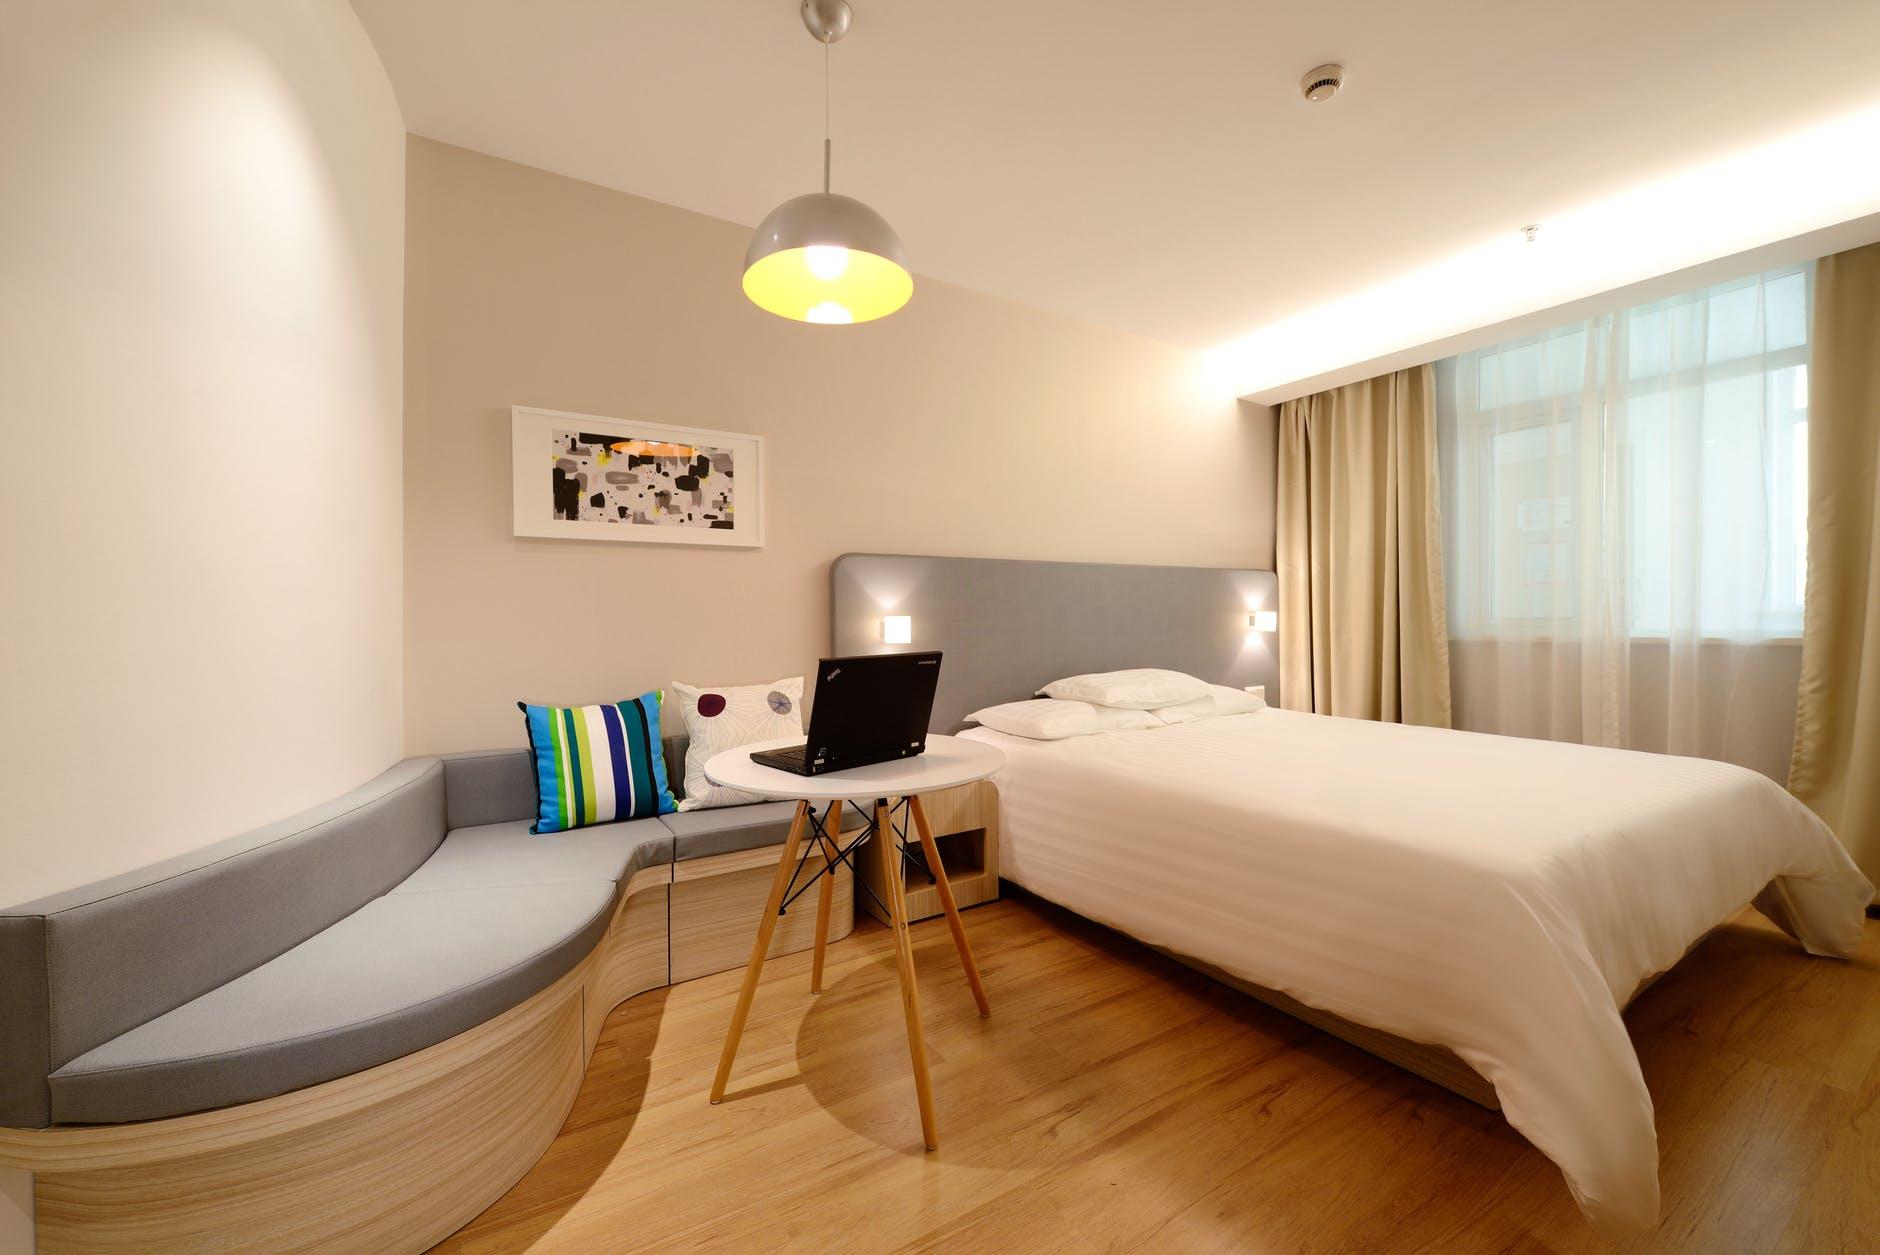 Small bedroom lighting designs 26